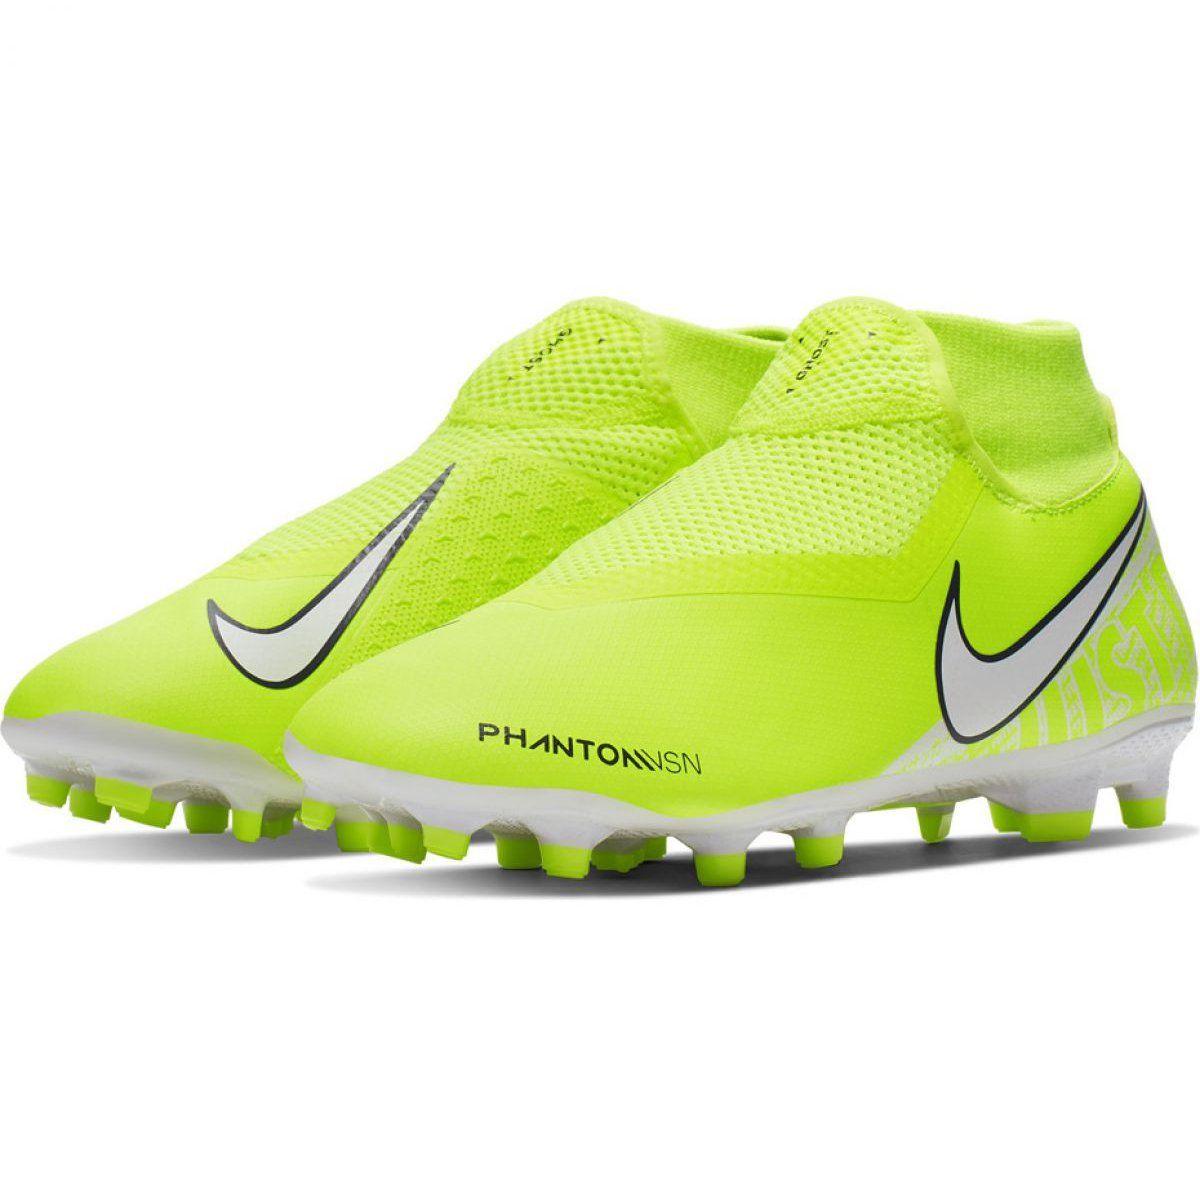 Buty Pilkarskie Nike Phantom Vsn Academy Df Fg Mg M Ao3258 717 Rozowe Zolte Soccer Cleats Football Shoes Nike